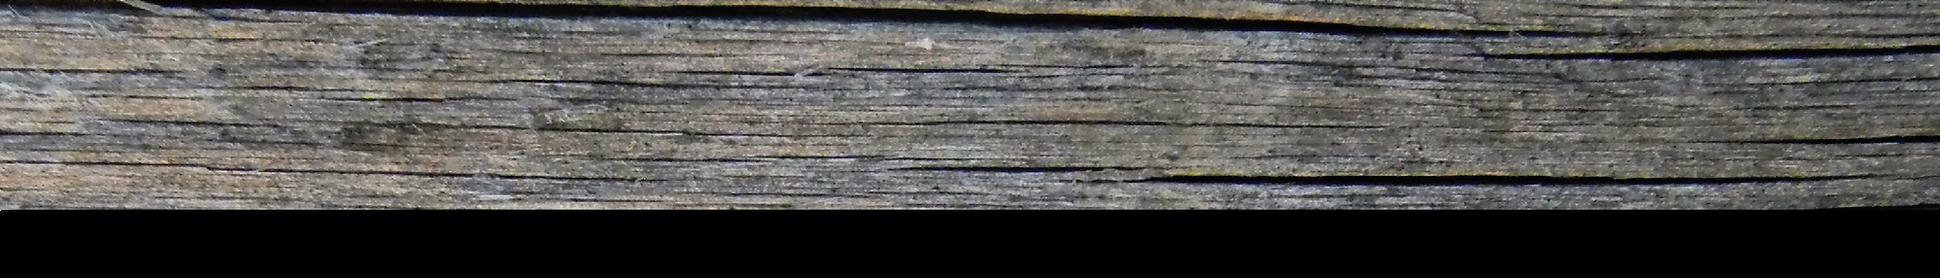 driftwood strip-01.png